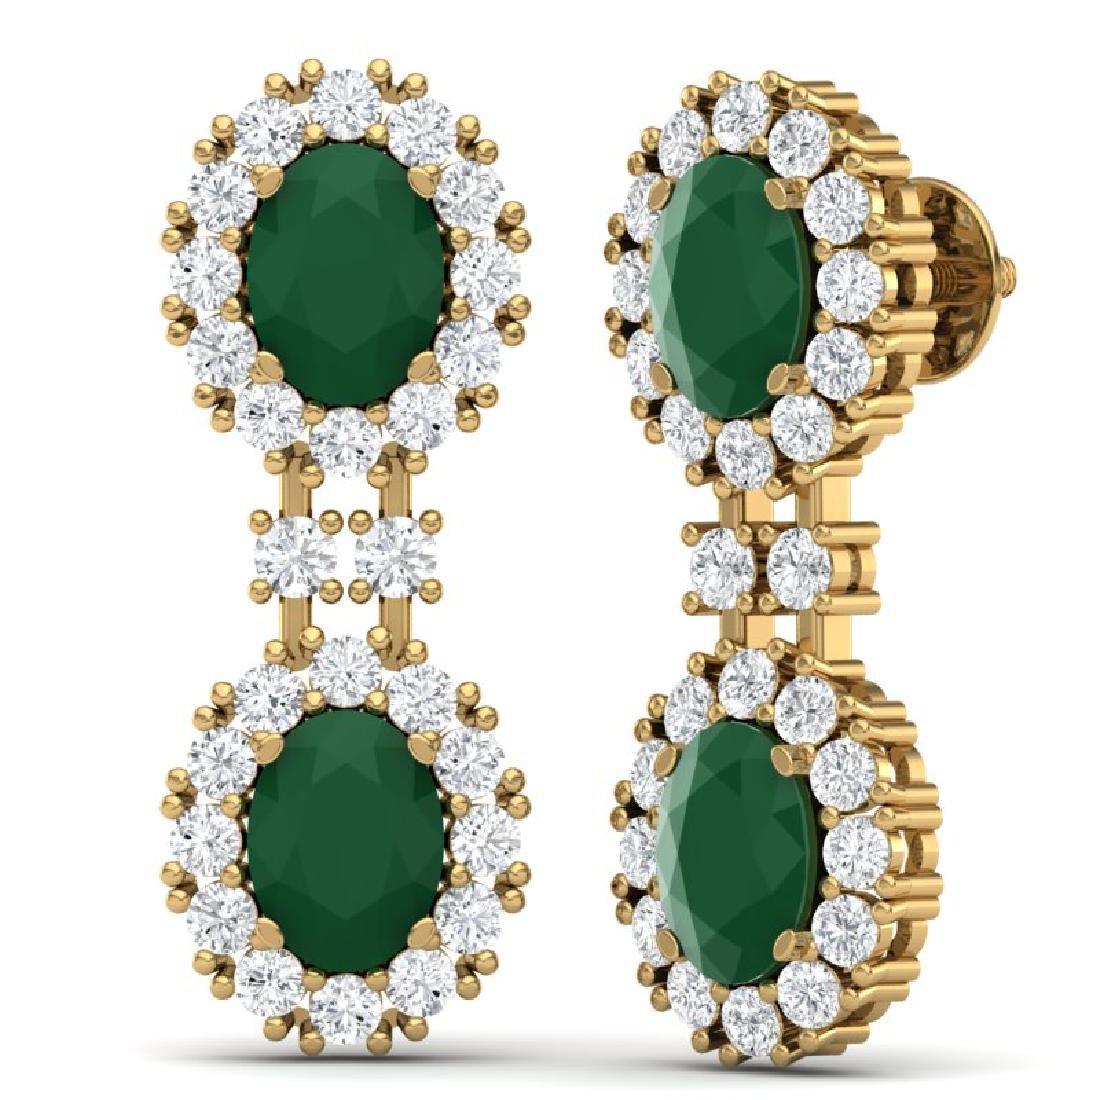 8.98 CTW Royalty Emerald & VS Diamond Earrings 18K - 3